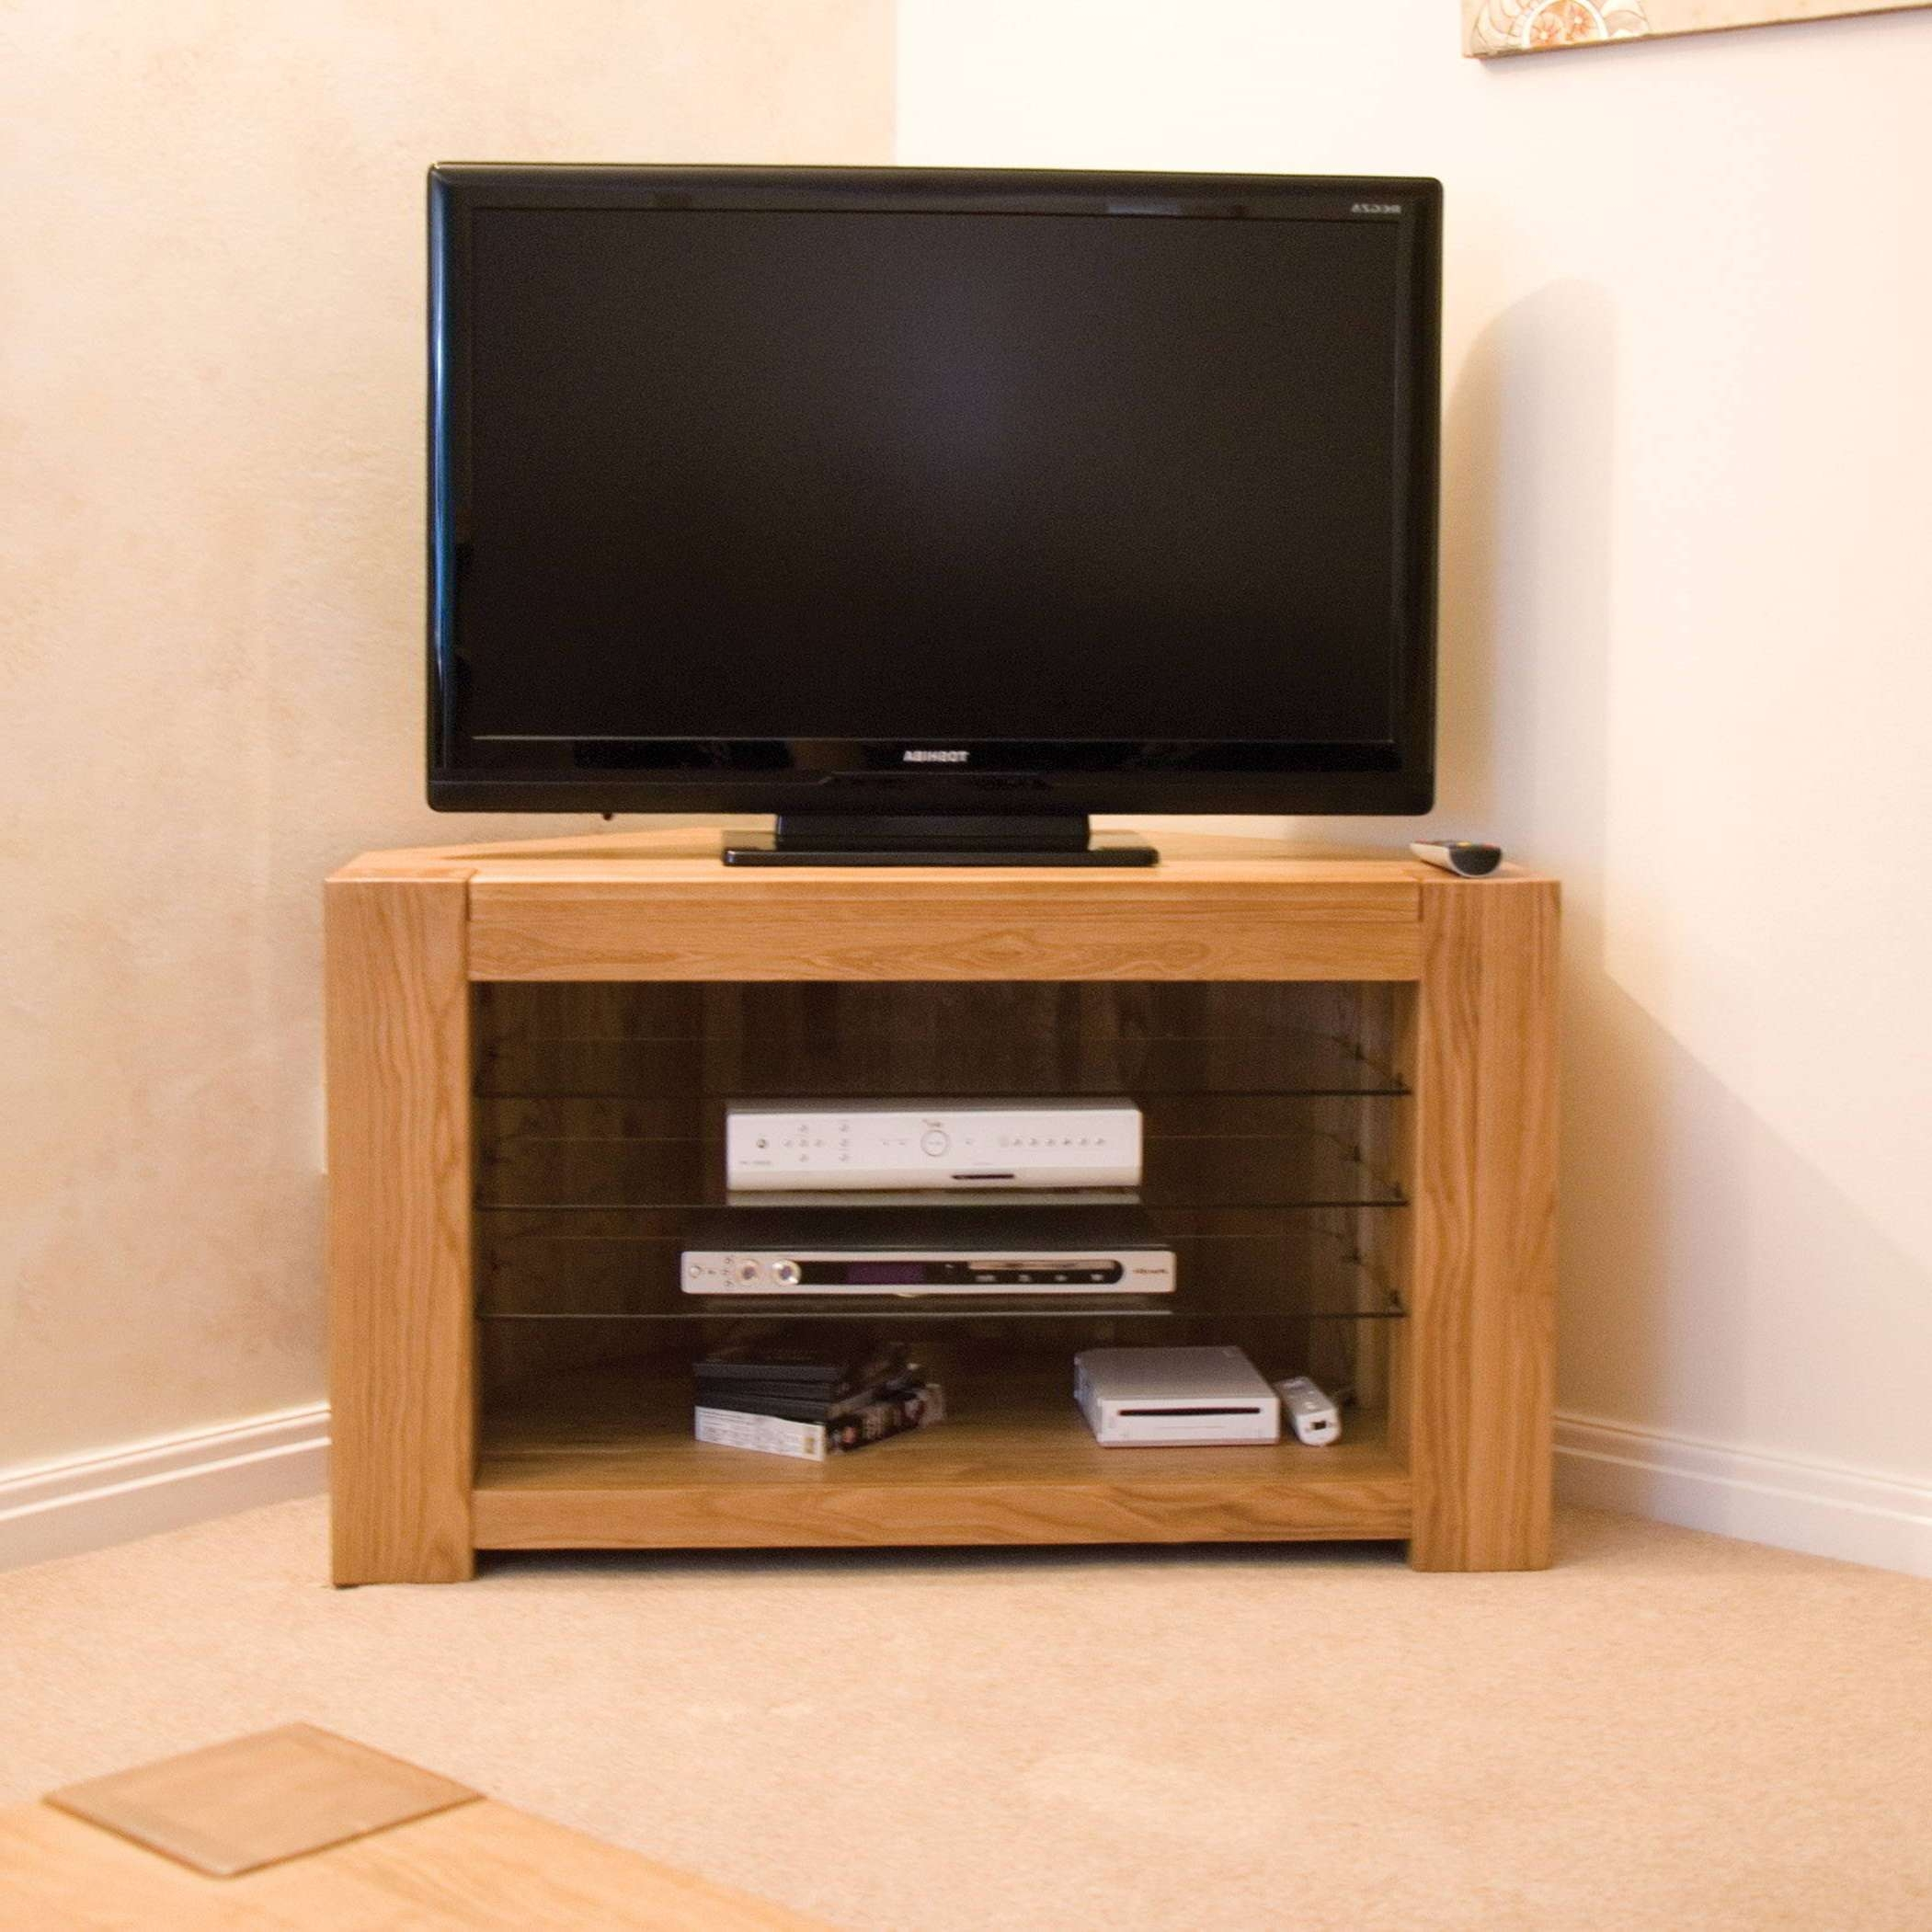 Padova Solid Oak Furniture Corner Television Cabinet Stand Unit | Ebay Inside Solid Oak Corner Tv Cabinets (View 14 of 20)